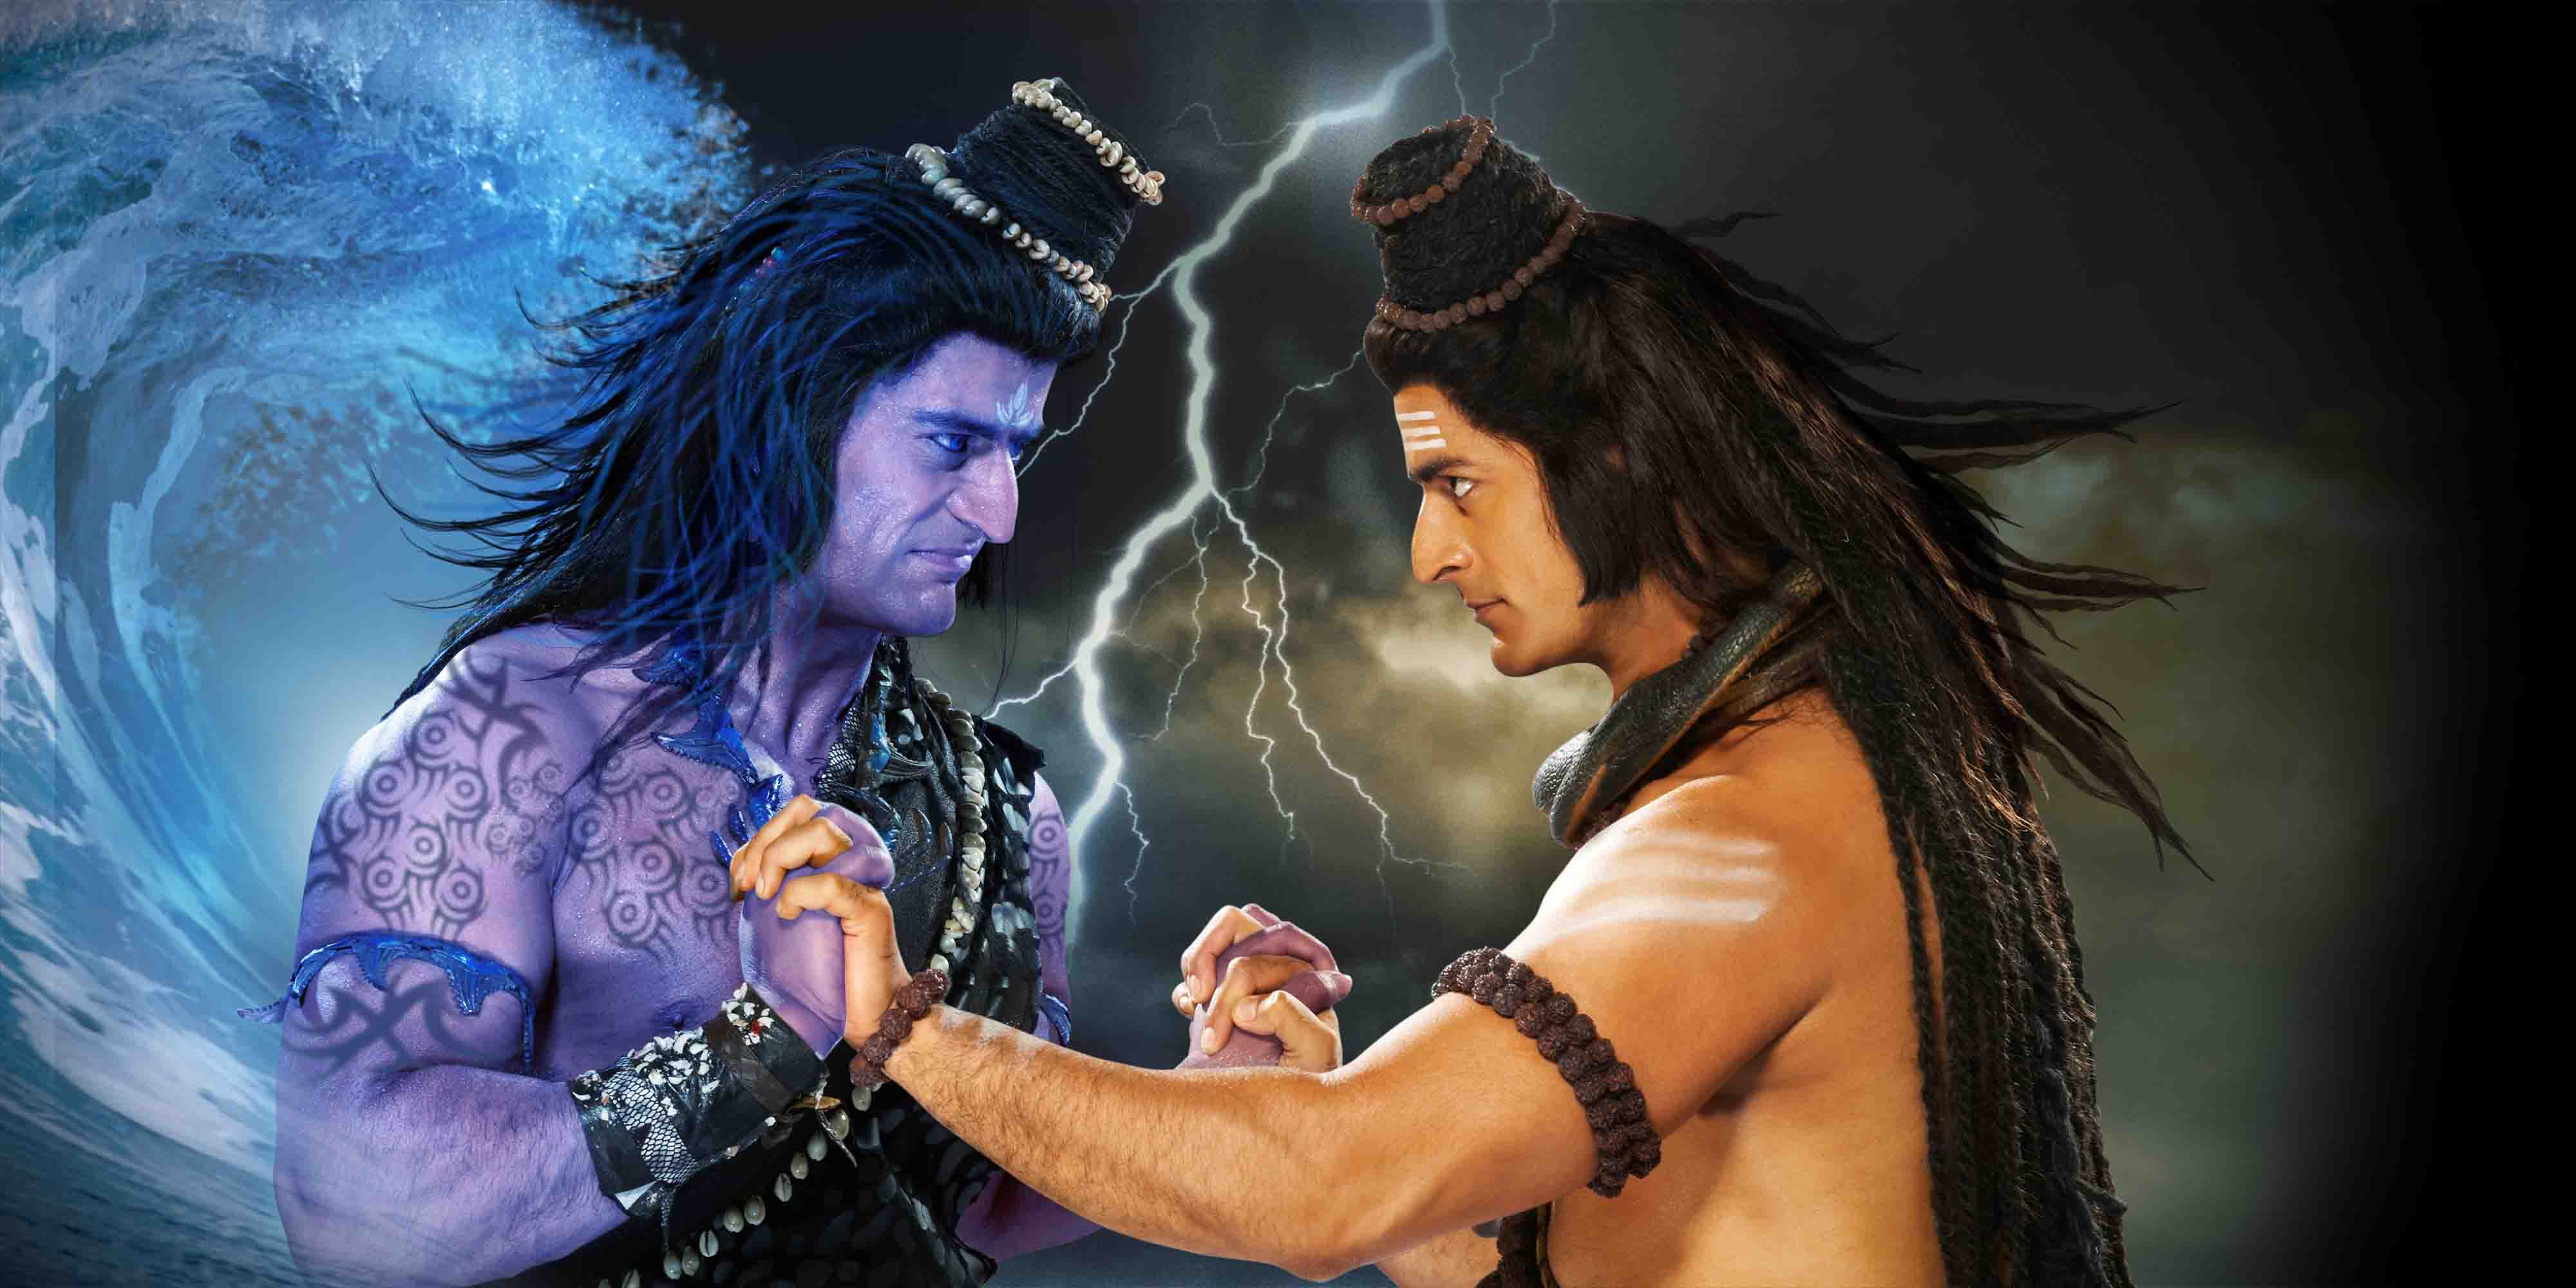 Badhaai.com: Beautiful Mahadev- Lord Shiva Images in HD